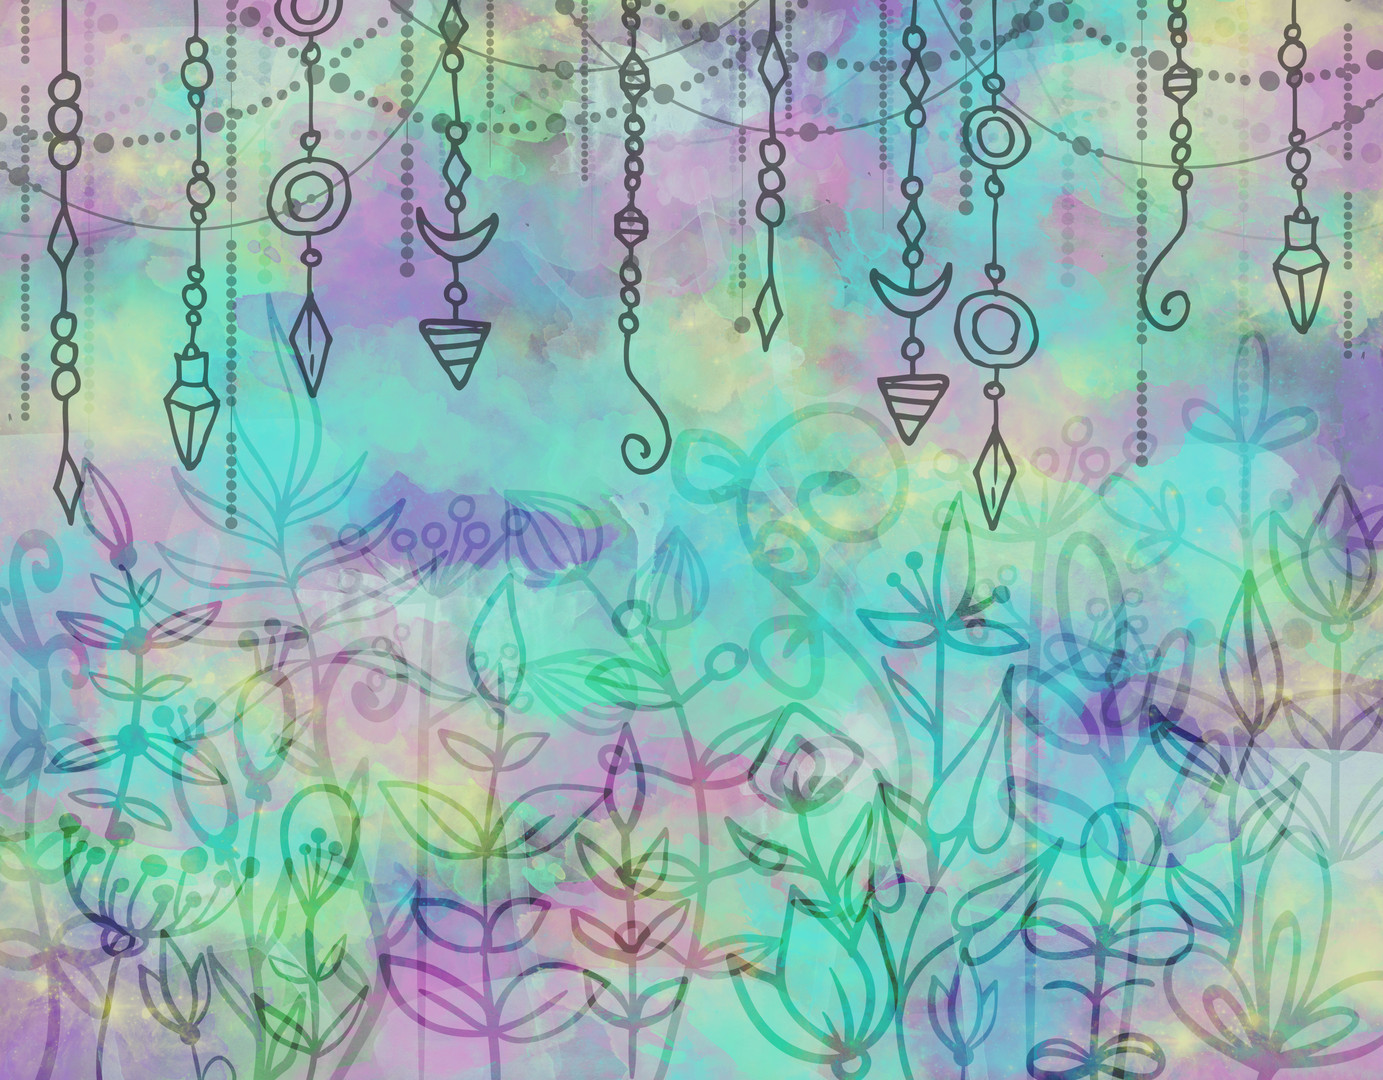 watercolour boho background.jpg